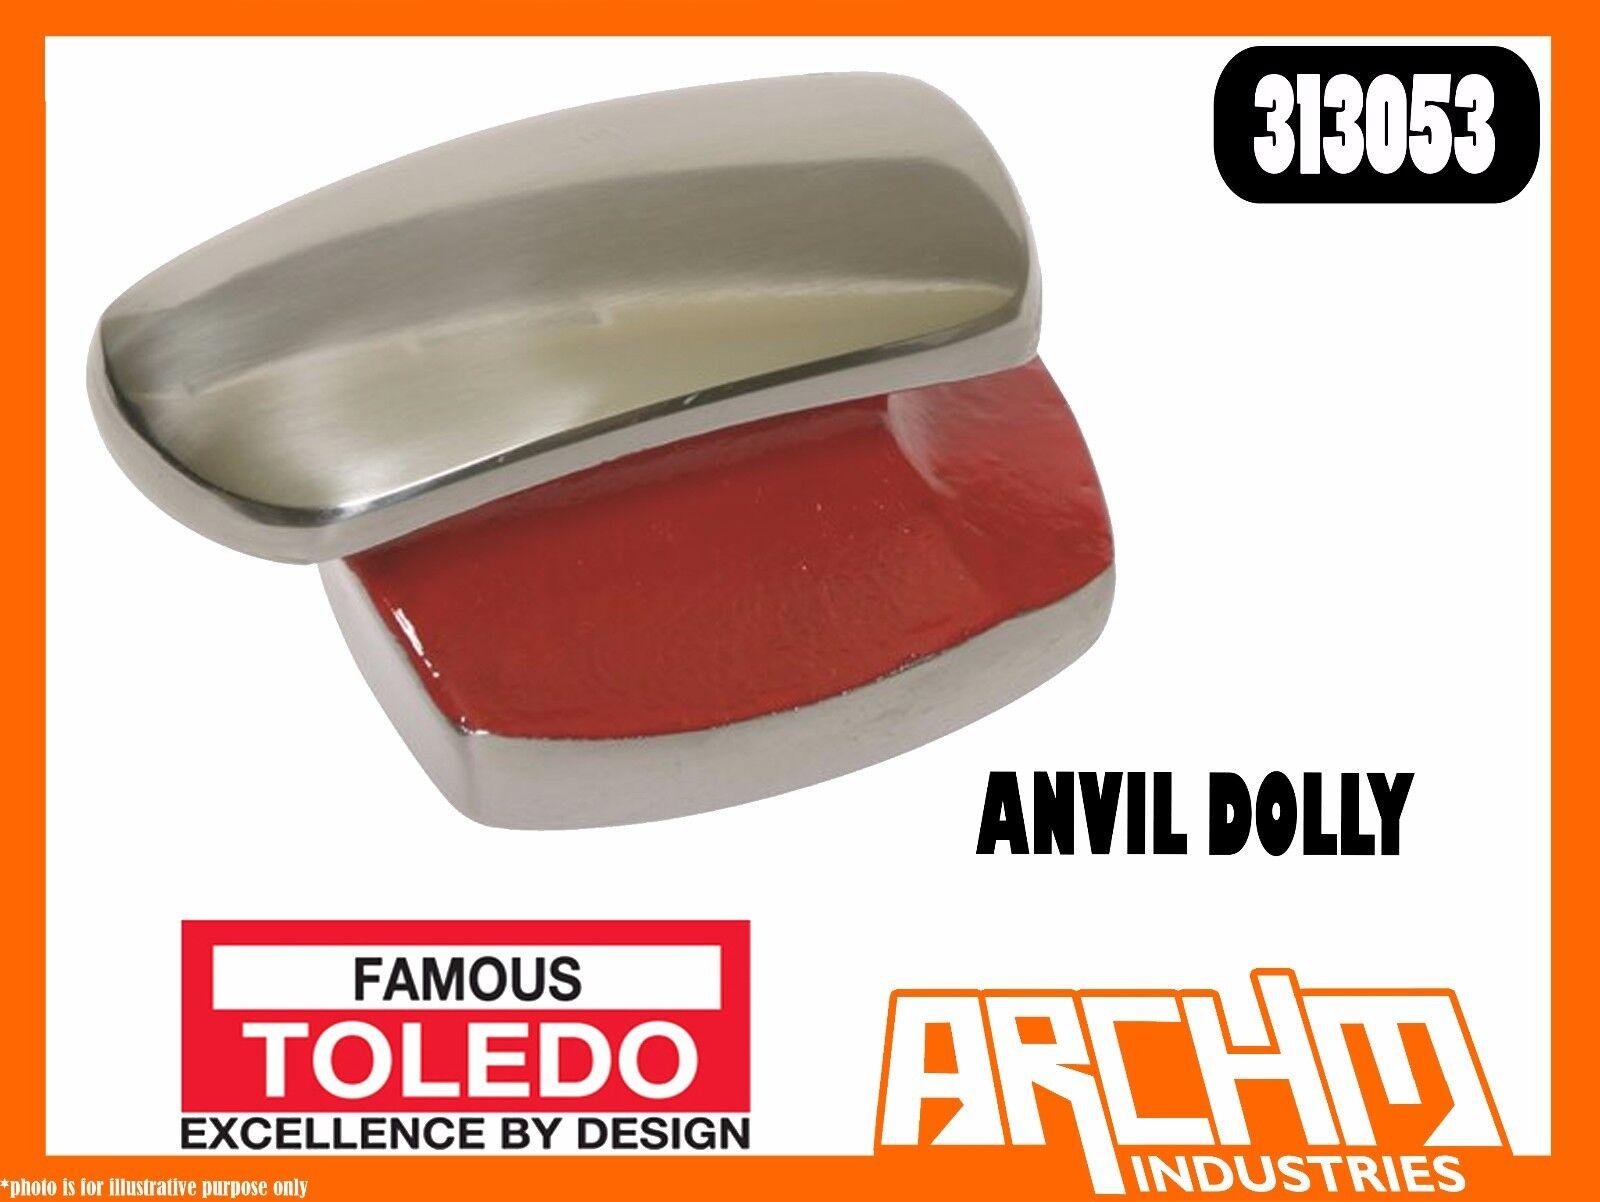 TOLEDO 313053 - ANVIL DOLLY - 95MM - GROUND POLISHED MIRROR FINISH TRADE DIY